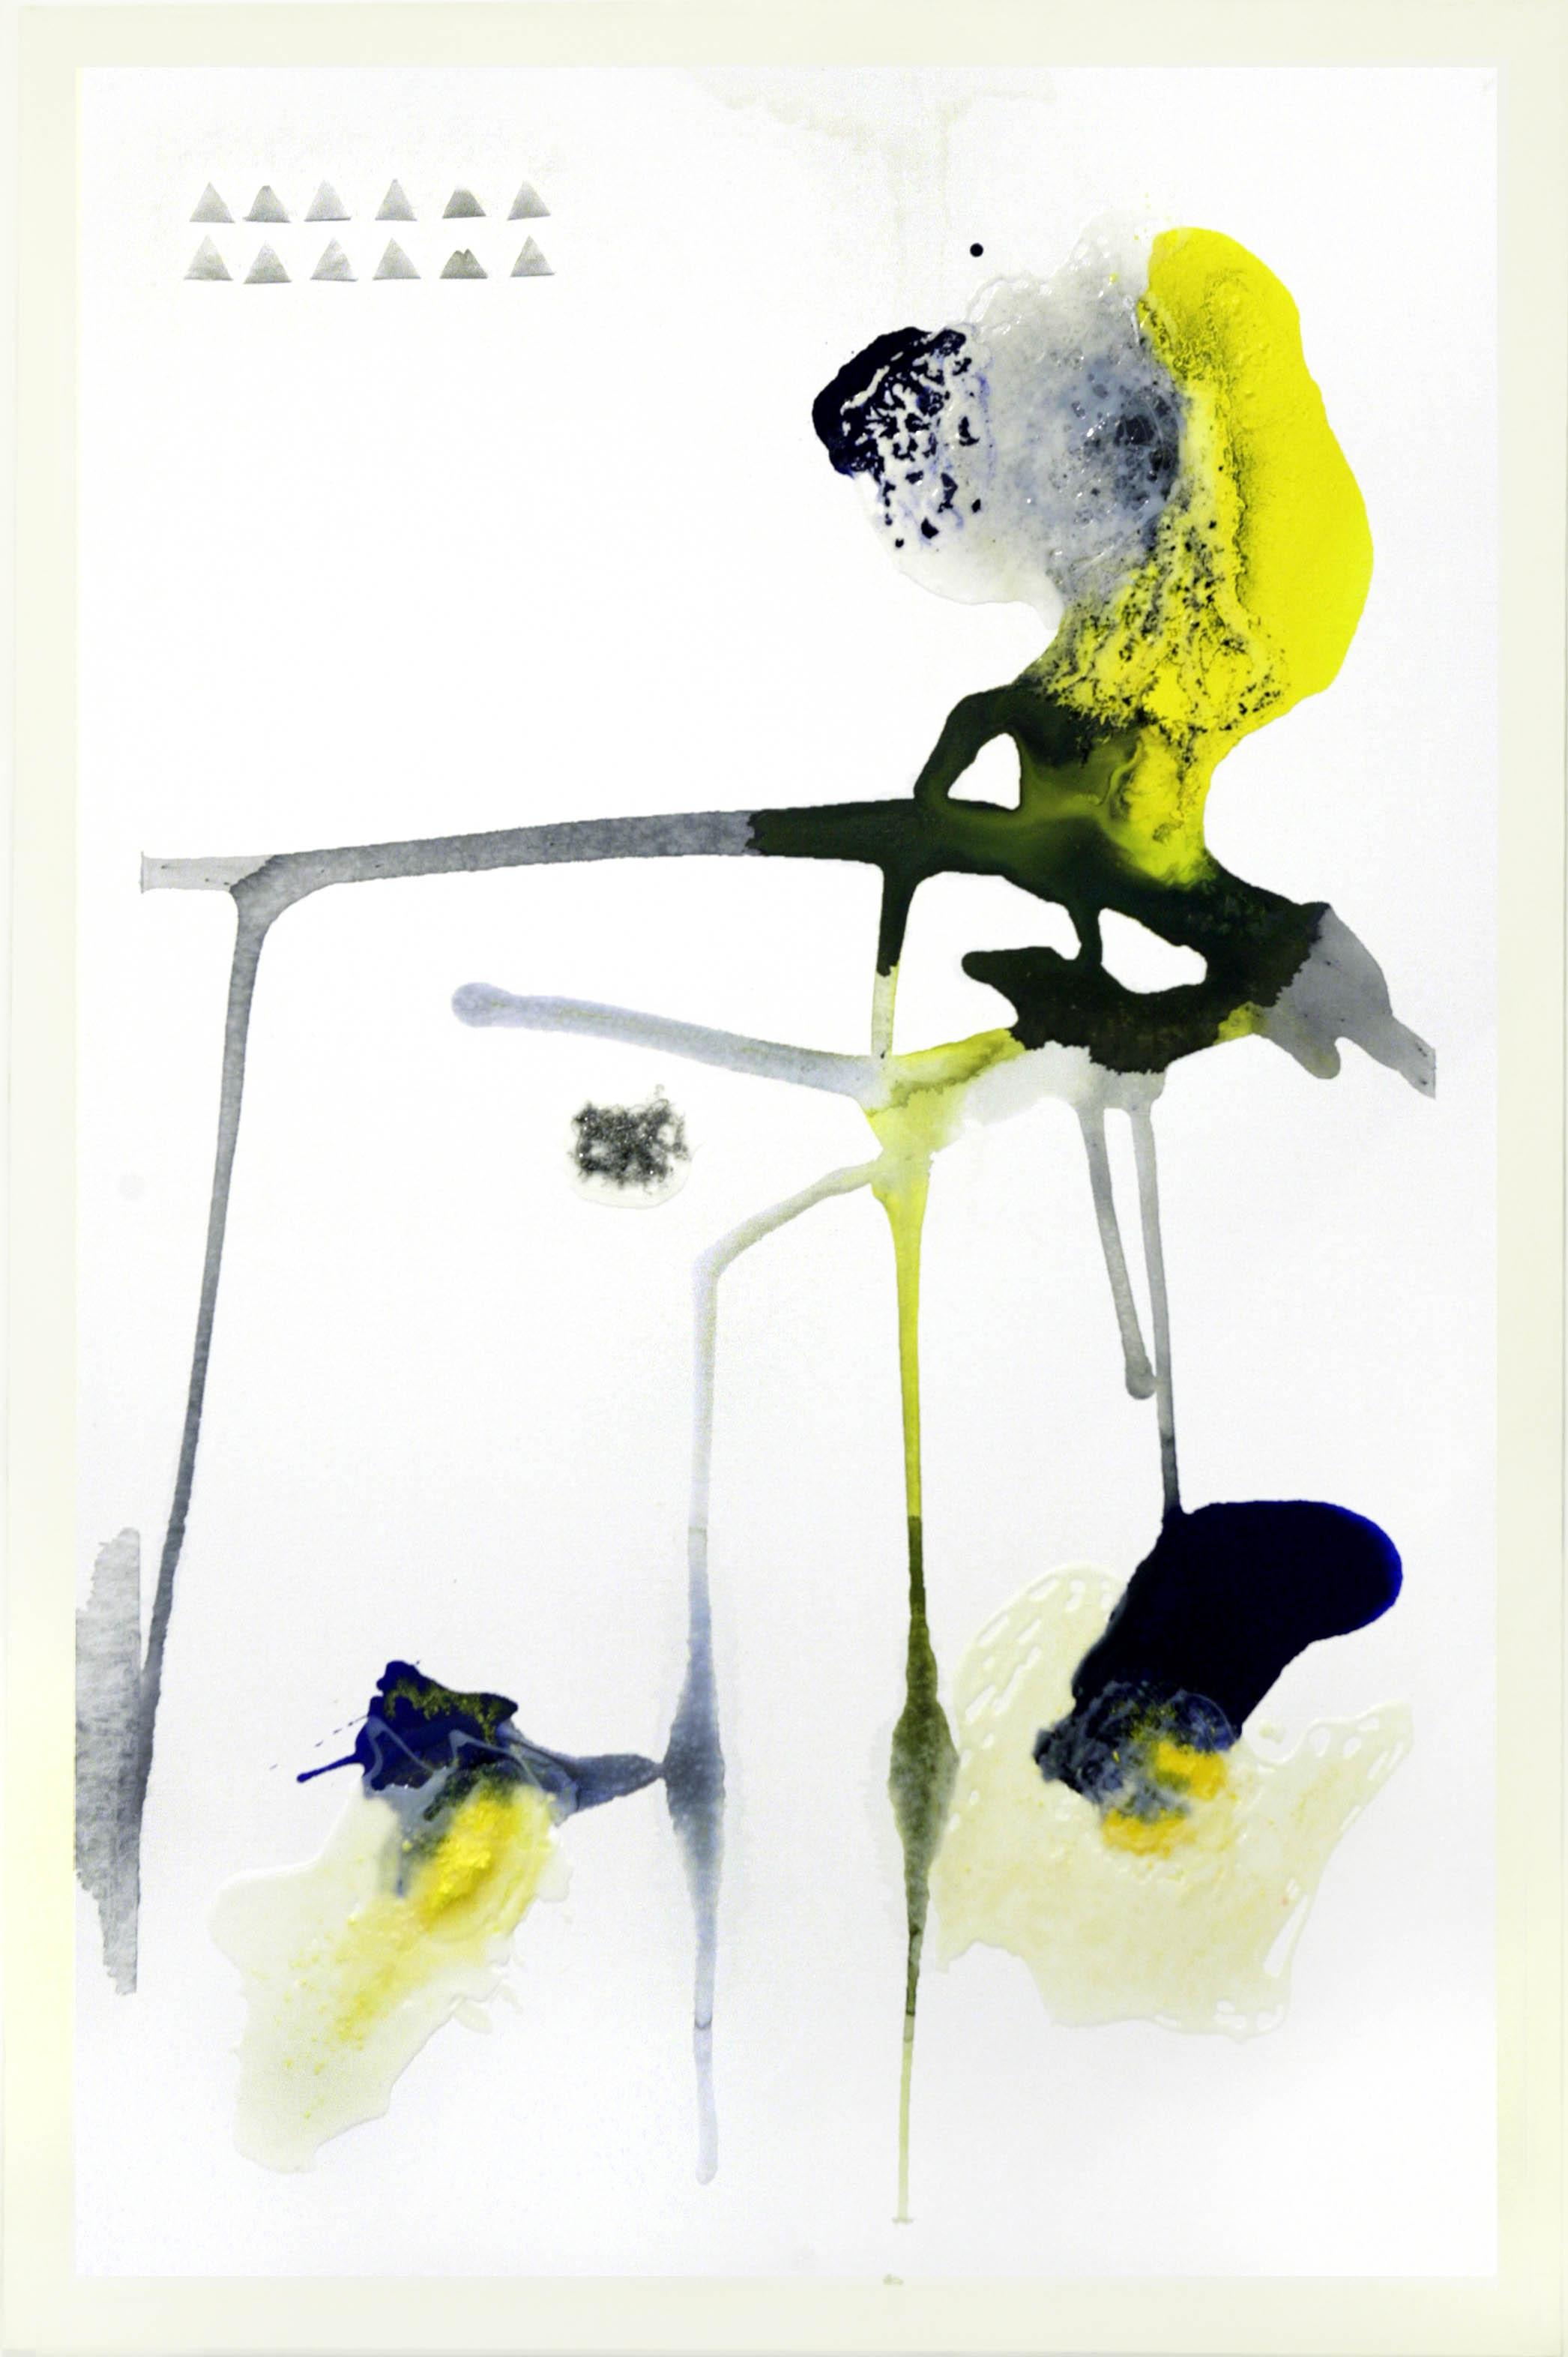 3. Untitled - cm 120 x 180 - mixed technique on canvas - photos by Dario Scialpi